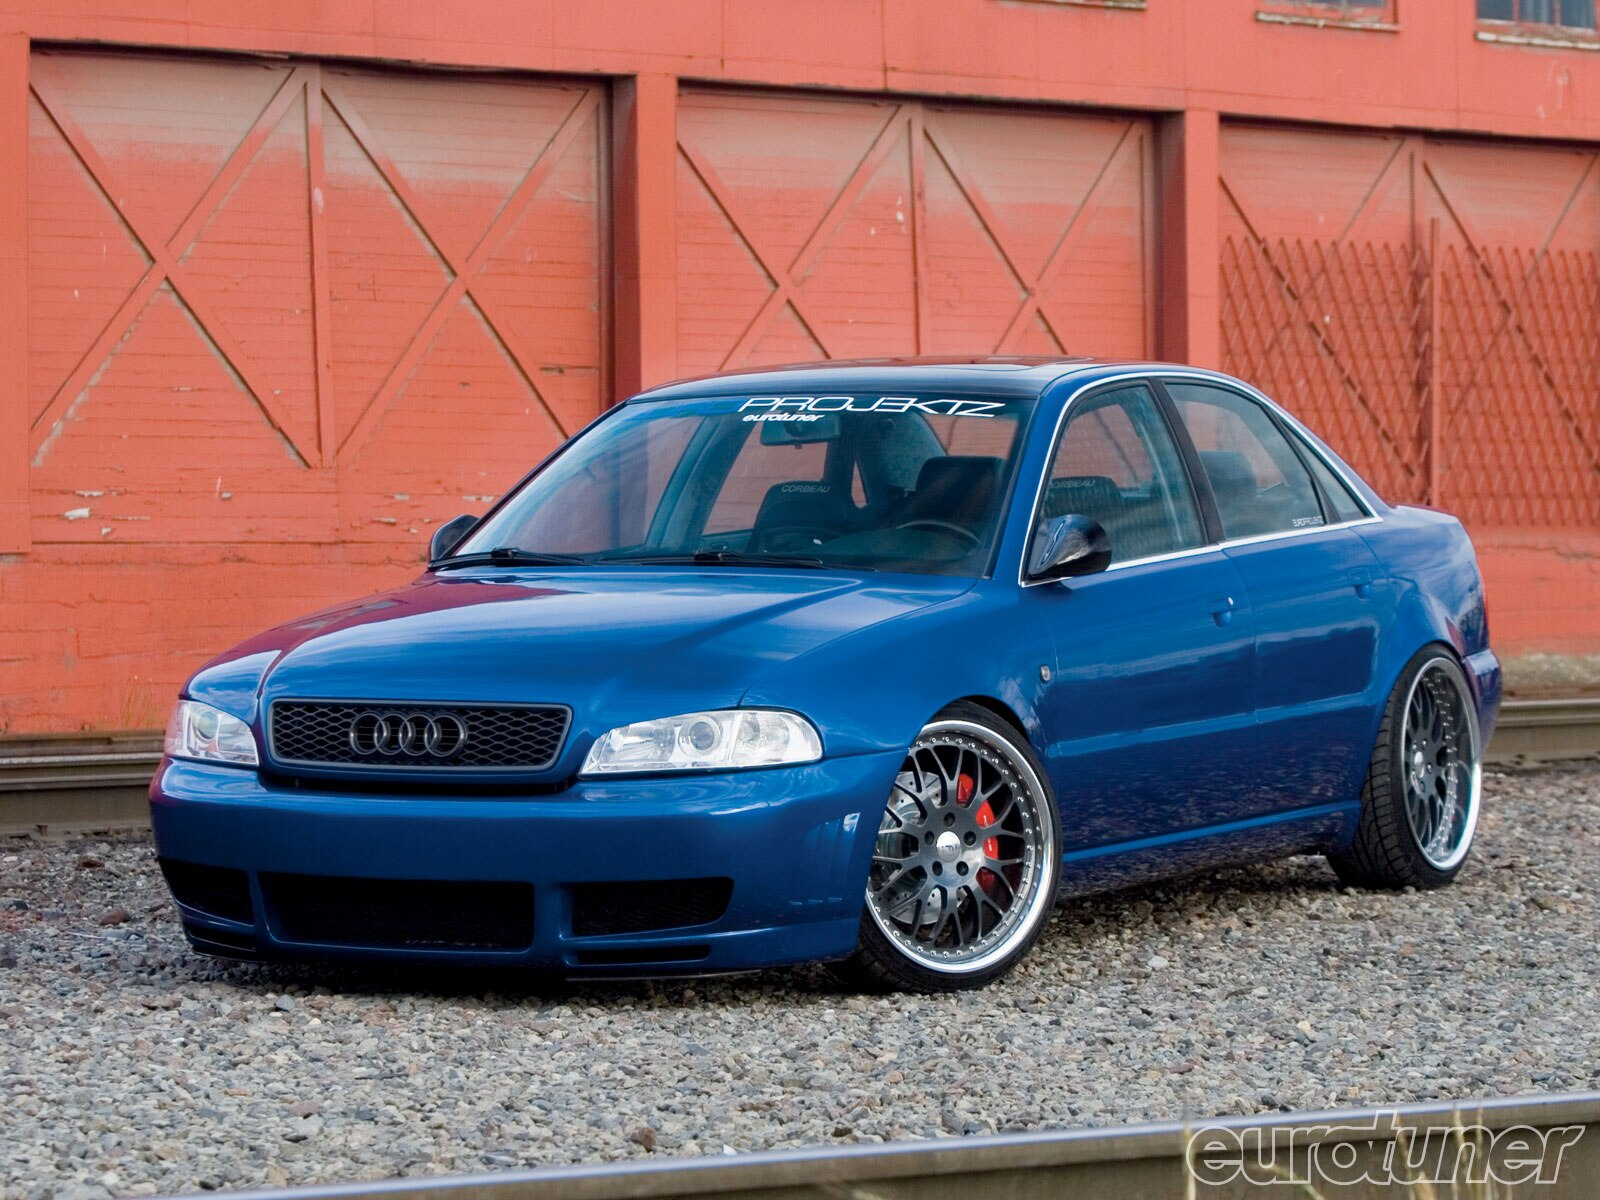 1997 Audi A4 2 8 Liter V6 Eurotuner Magazine